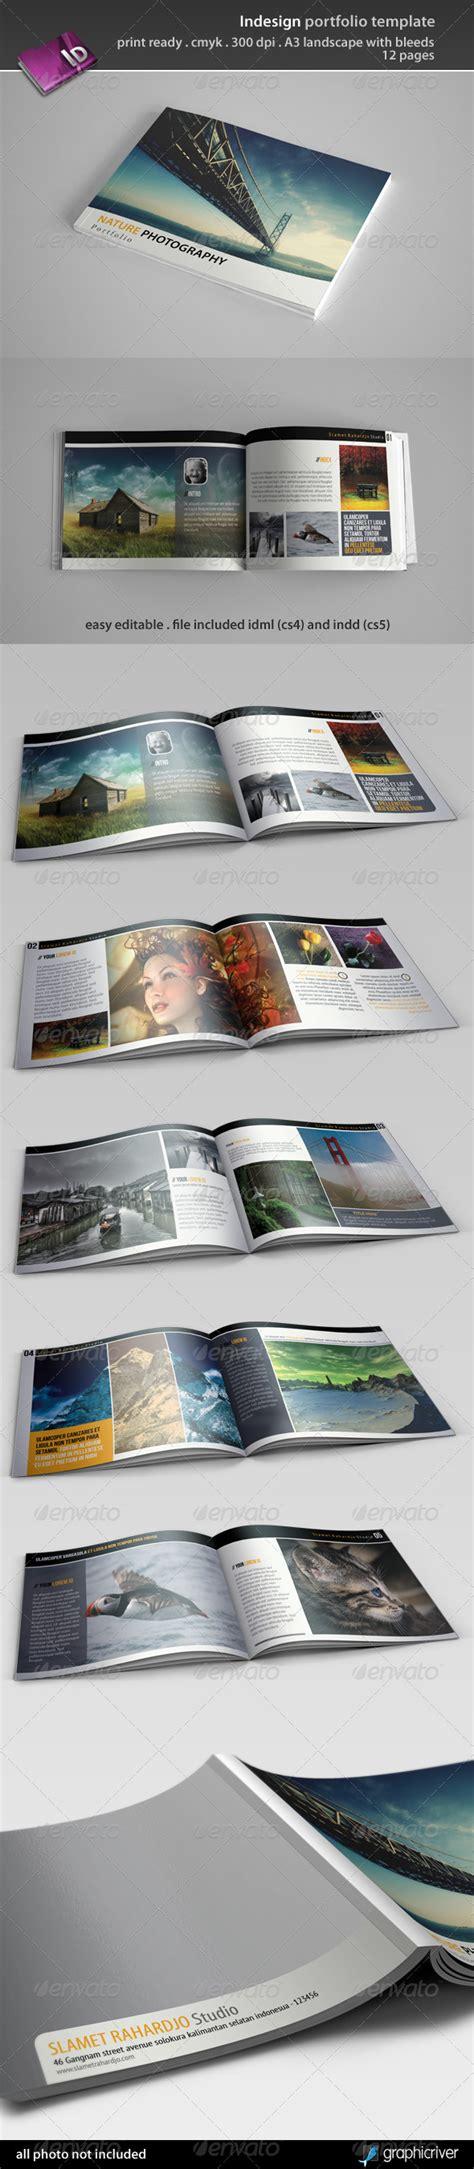 portfolio print template indesign portfolio template by semutireng graphicriver